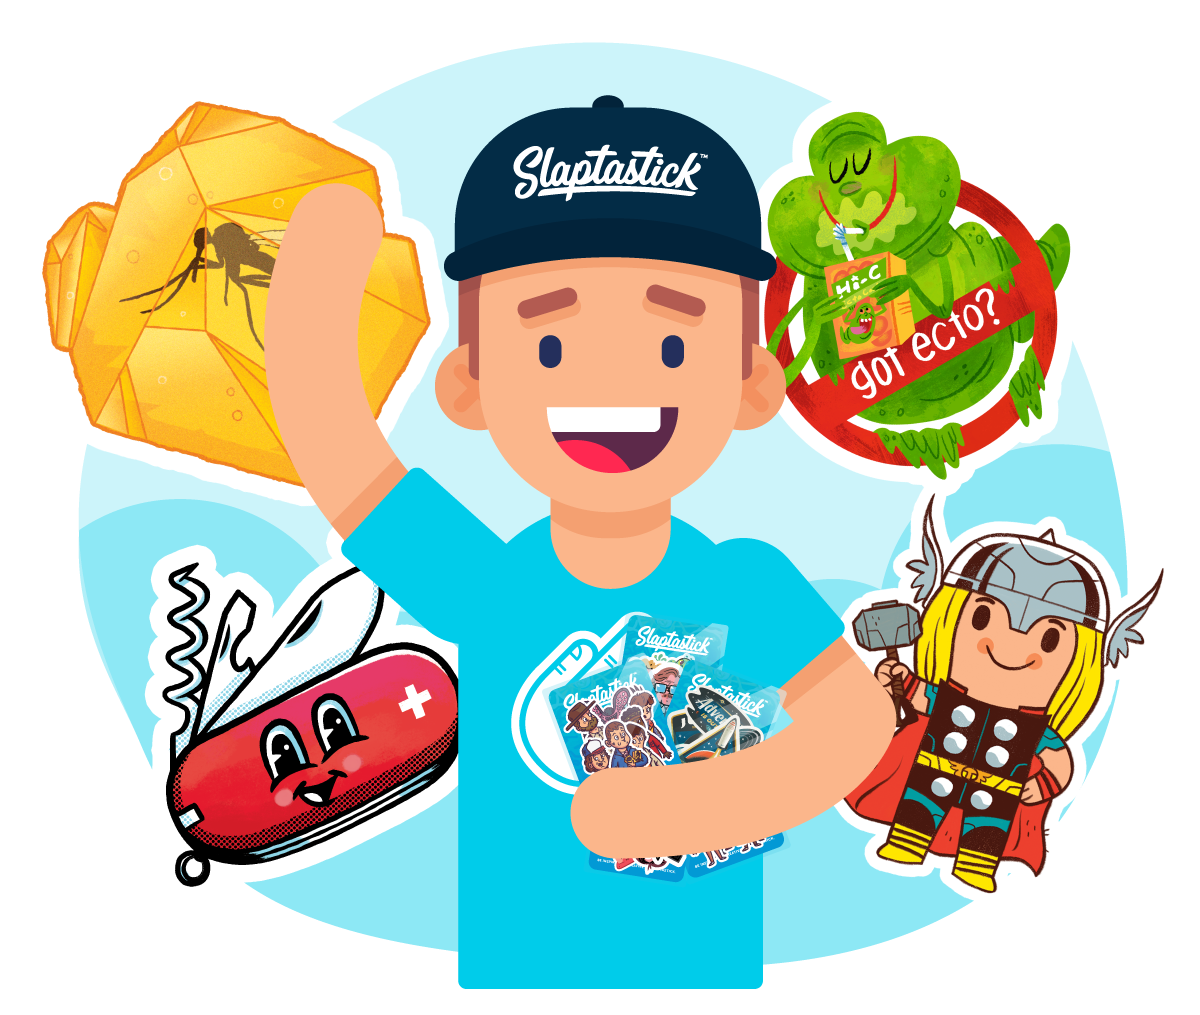 Slaptastick_Website_Essentials_spot.png